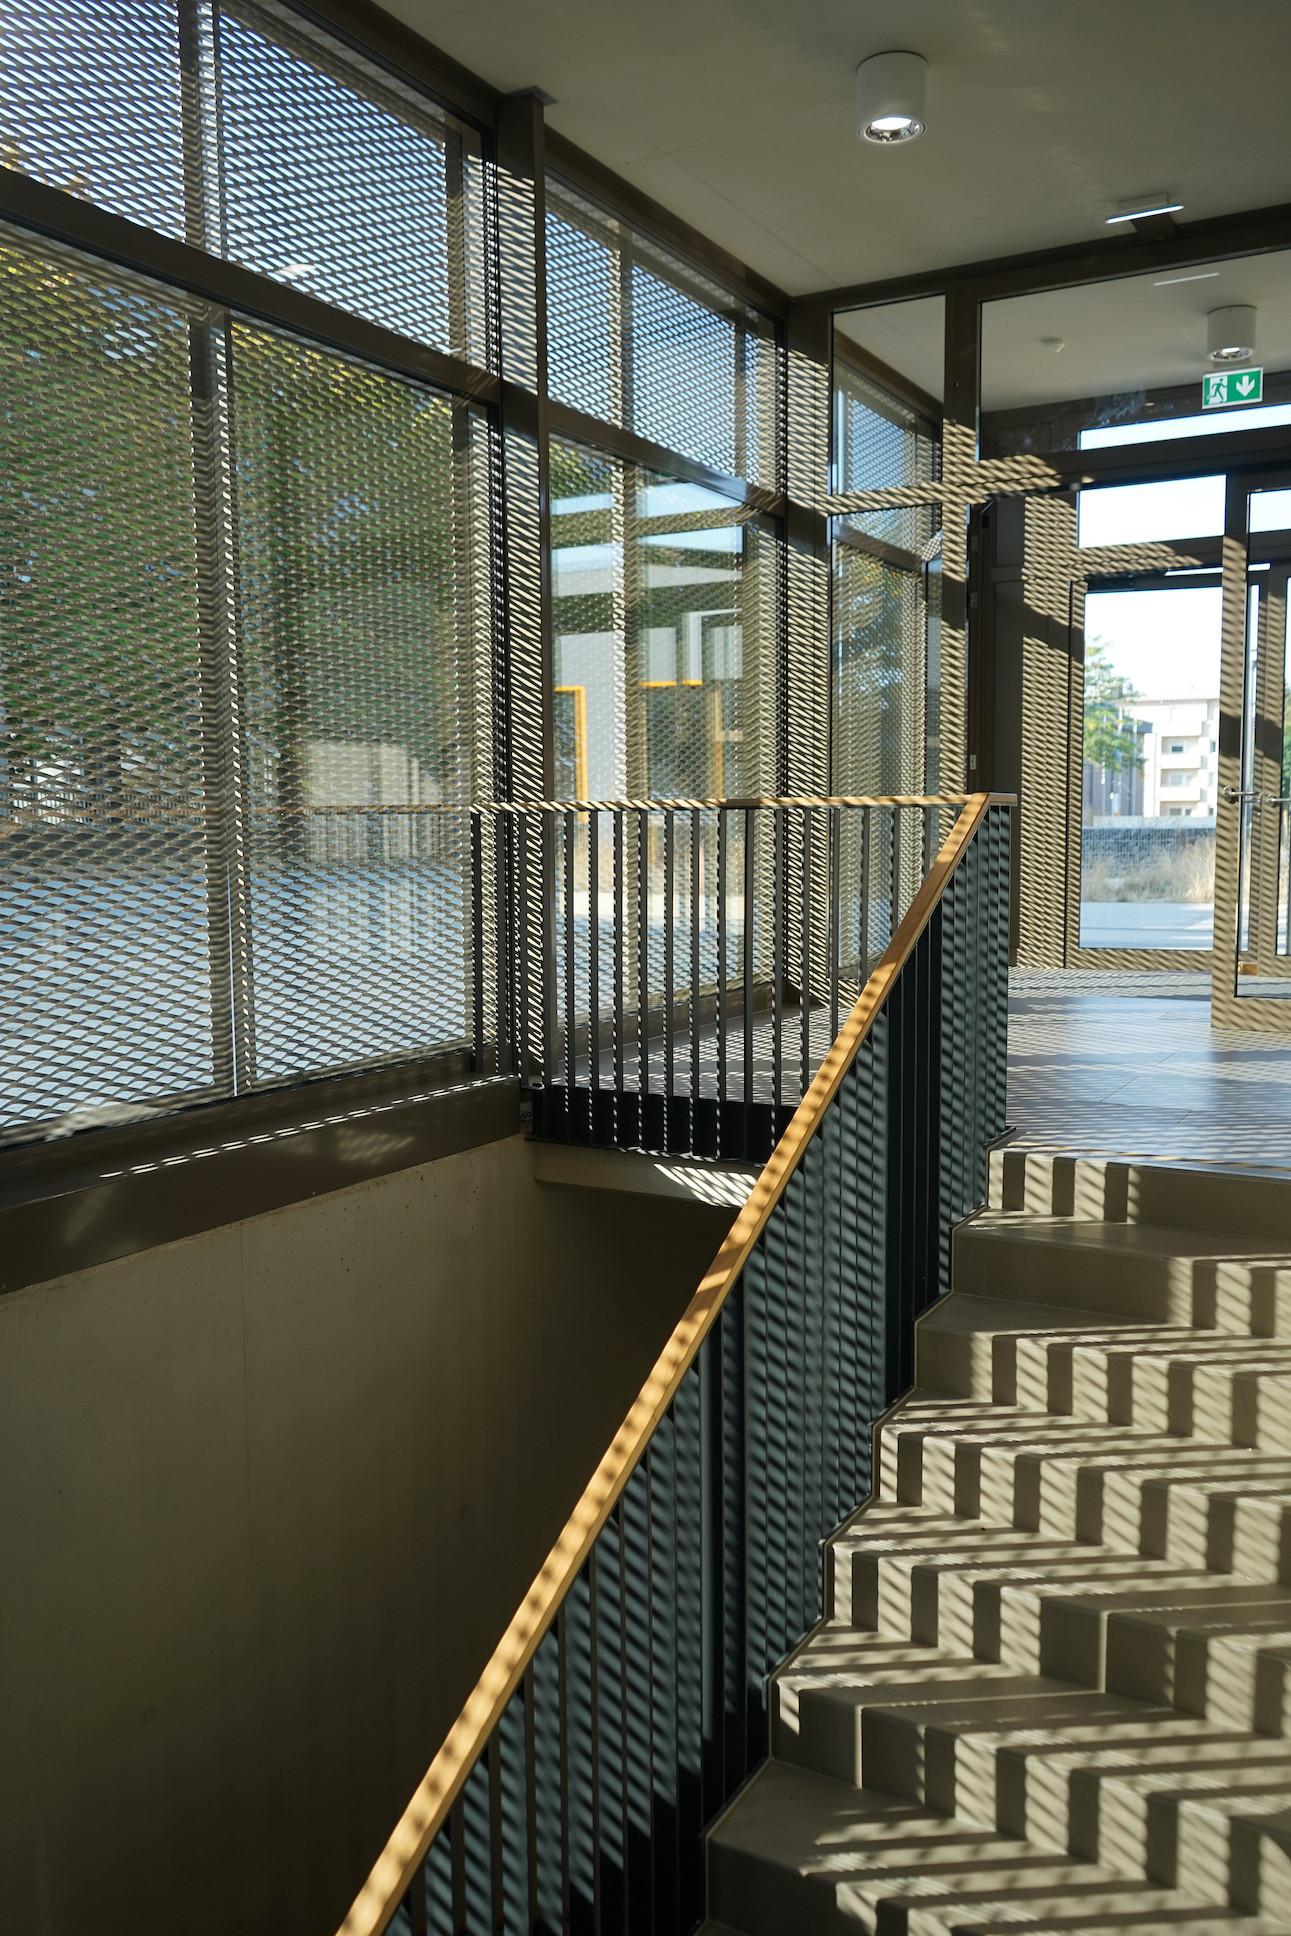 Metal mesh panels serve as solar protection.                               (Decker, Lammar & Associés)